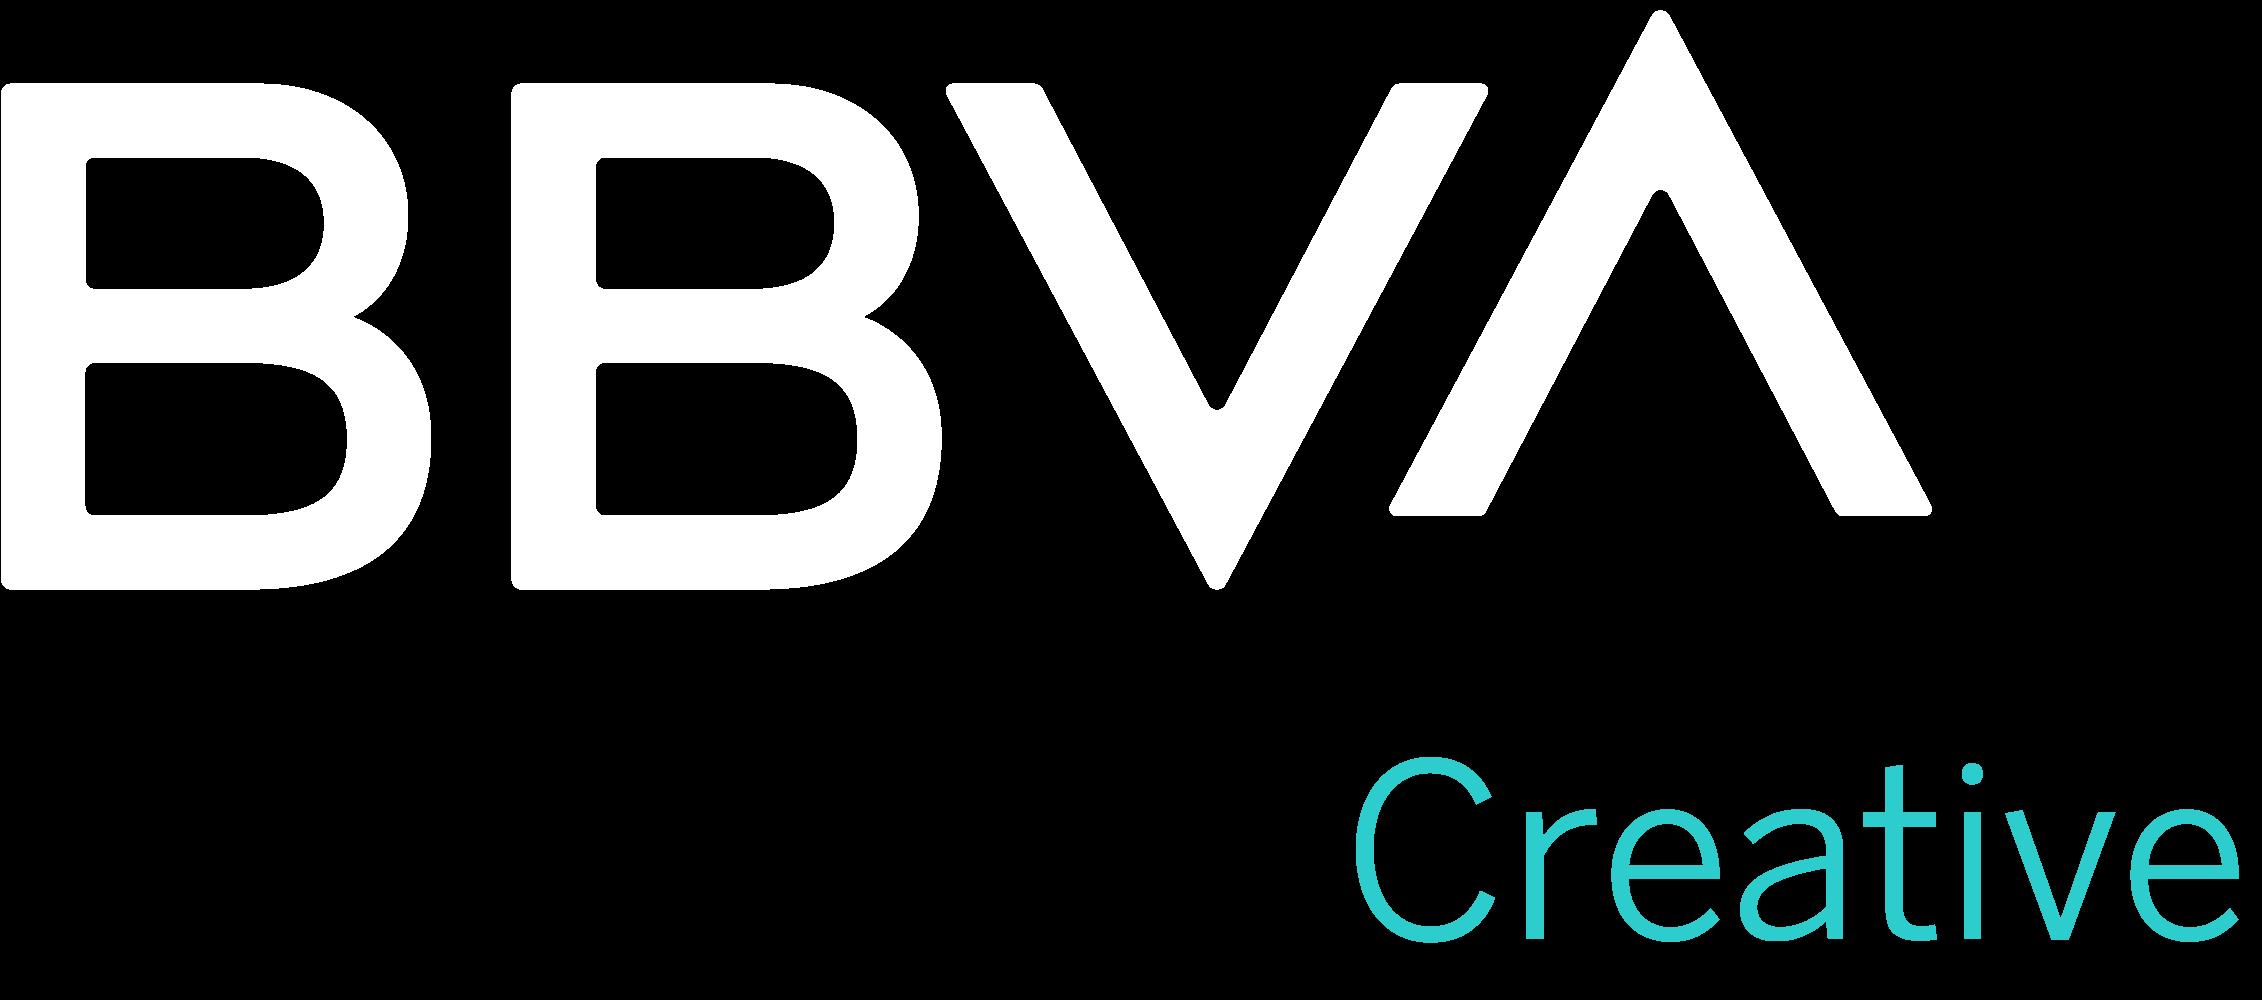 BBVA Creative